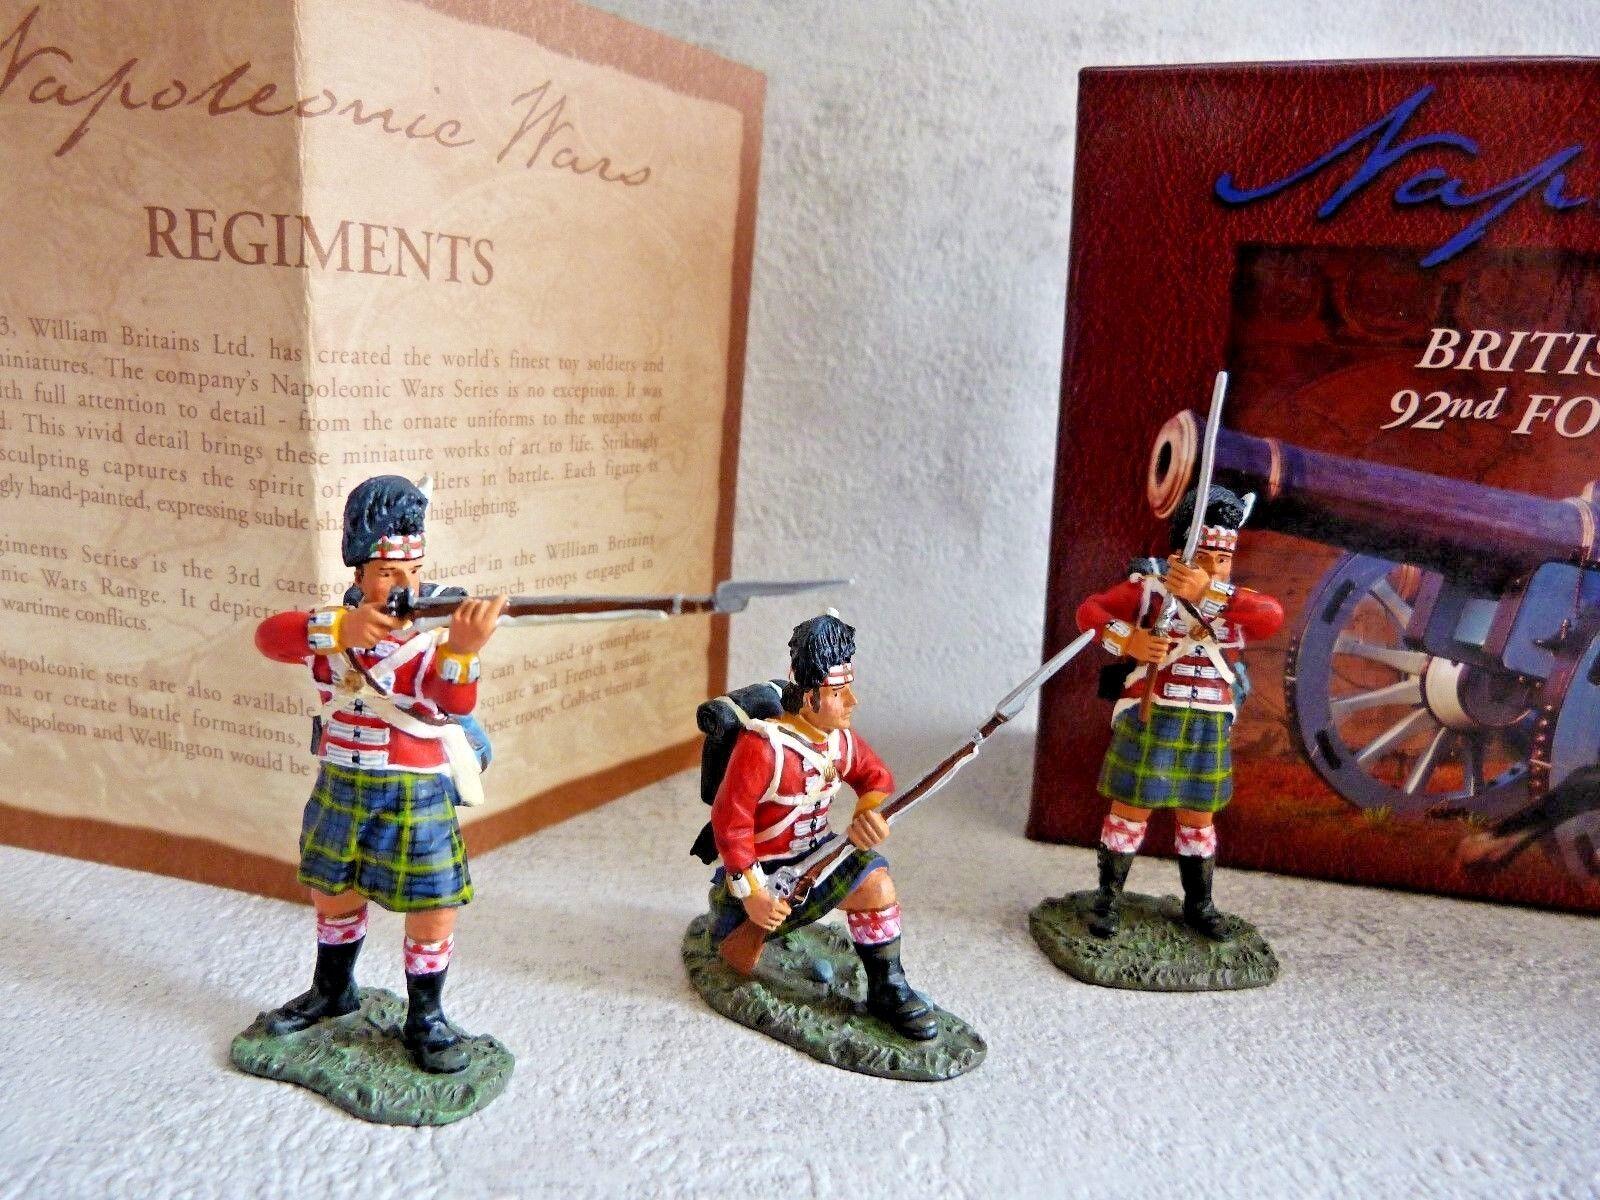 BRITTAINS 17297 Brittiska 92nd Foot - Guerres Napol 6553333;...te